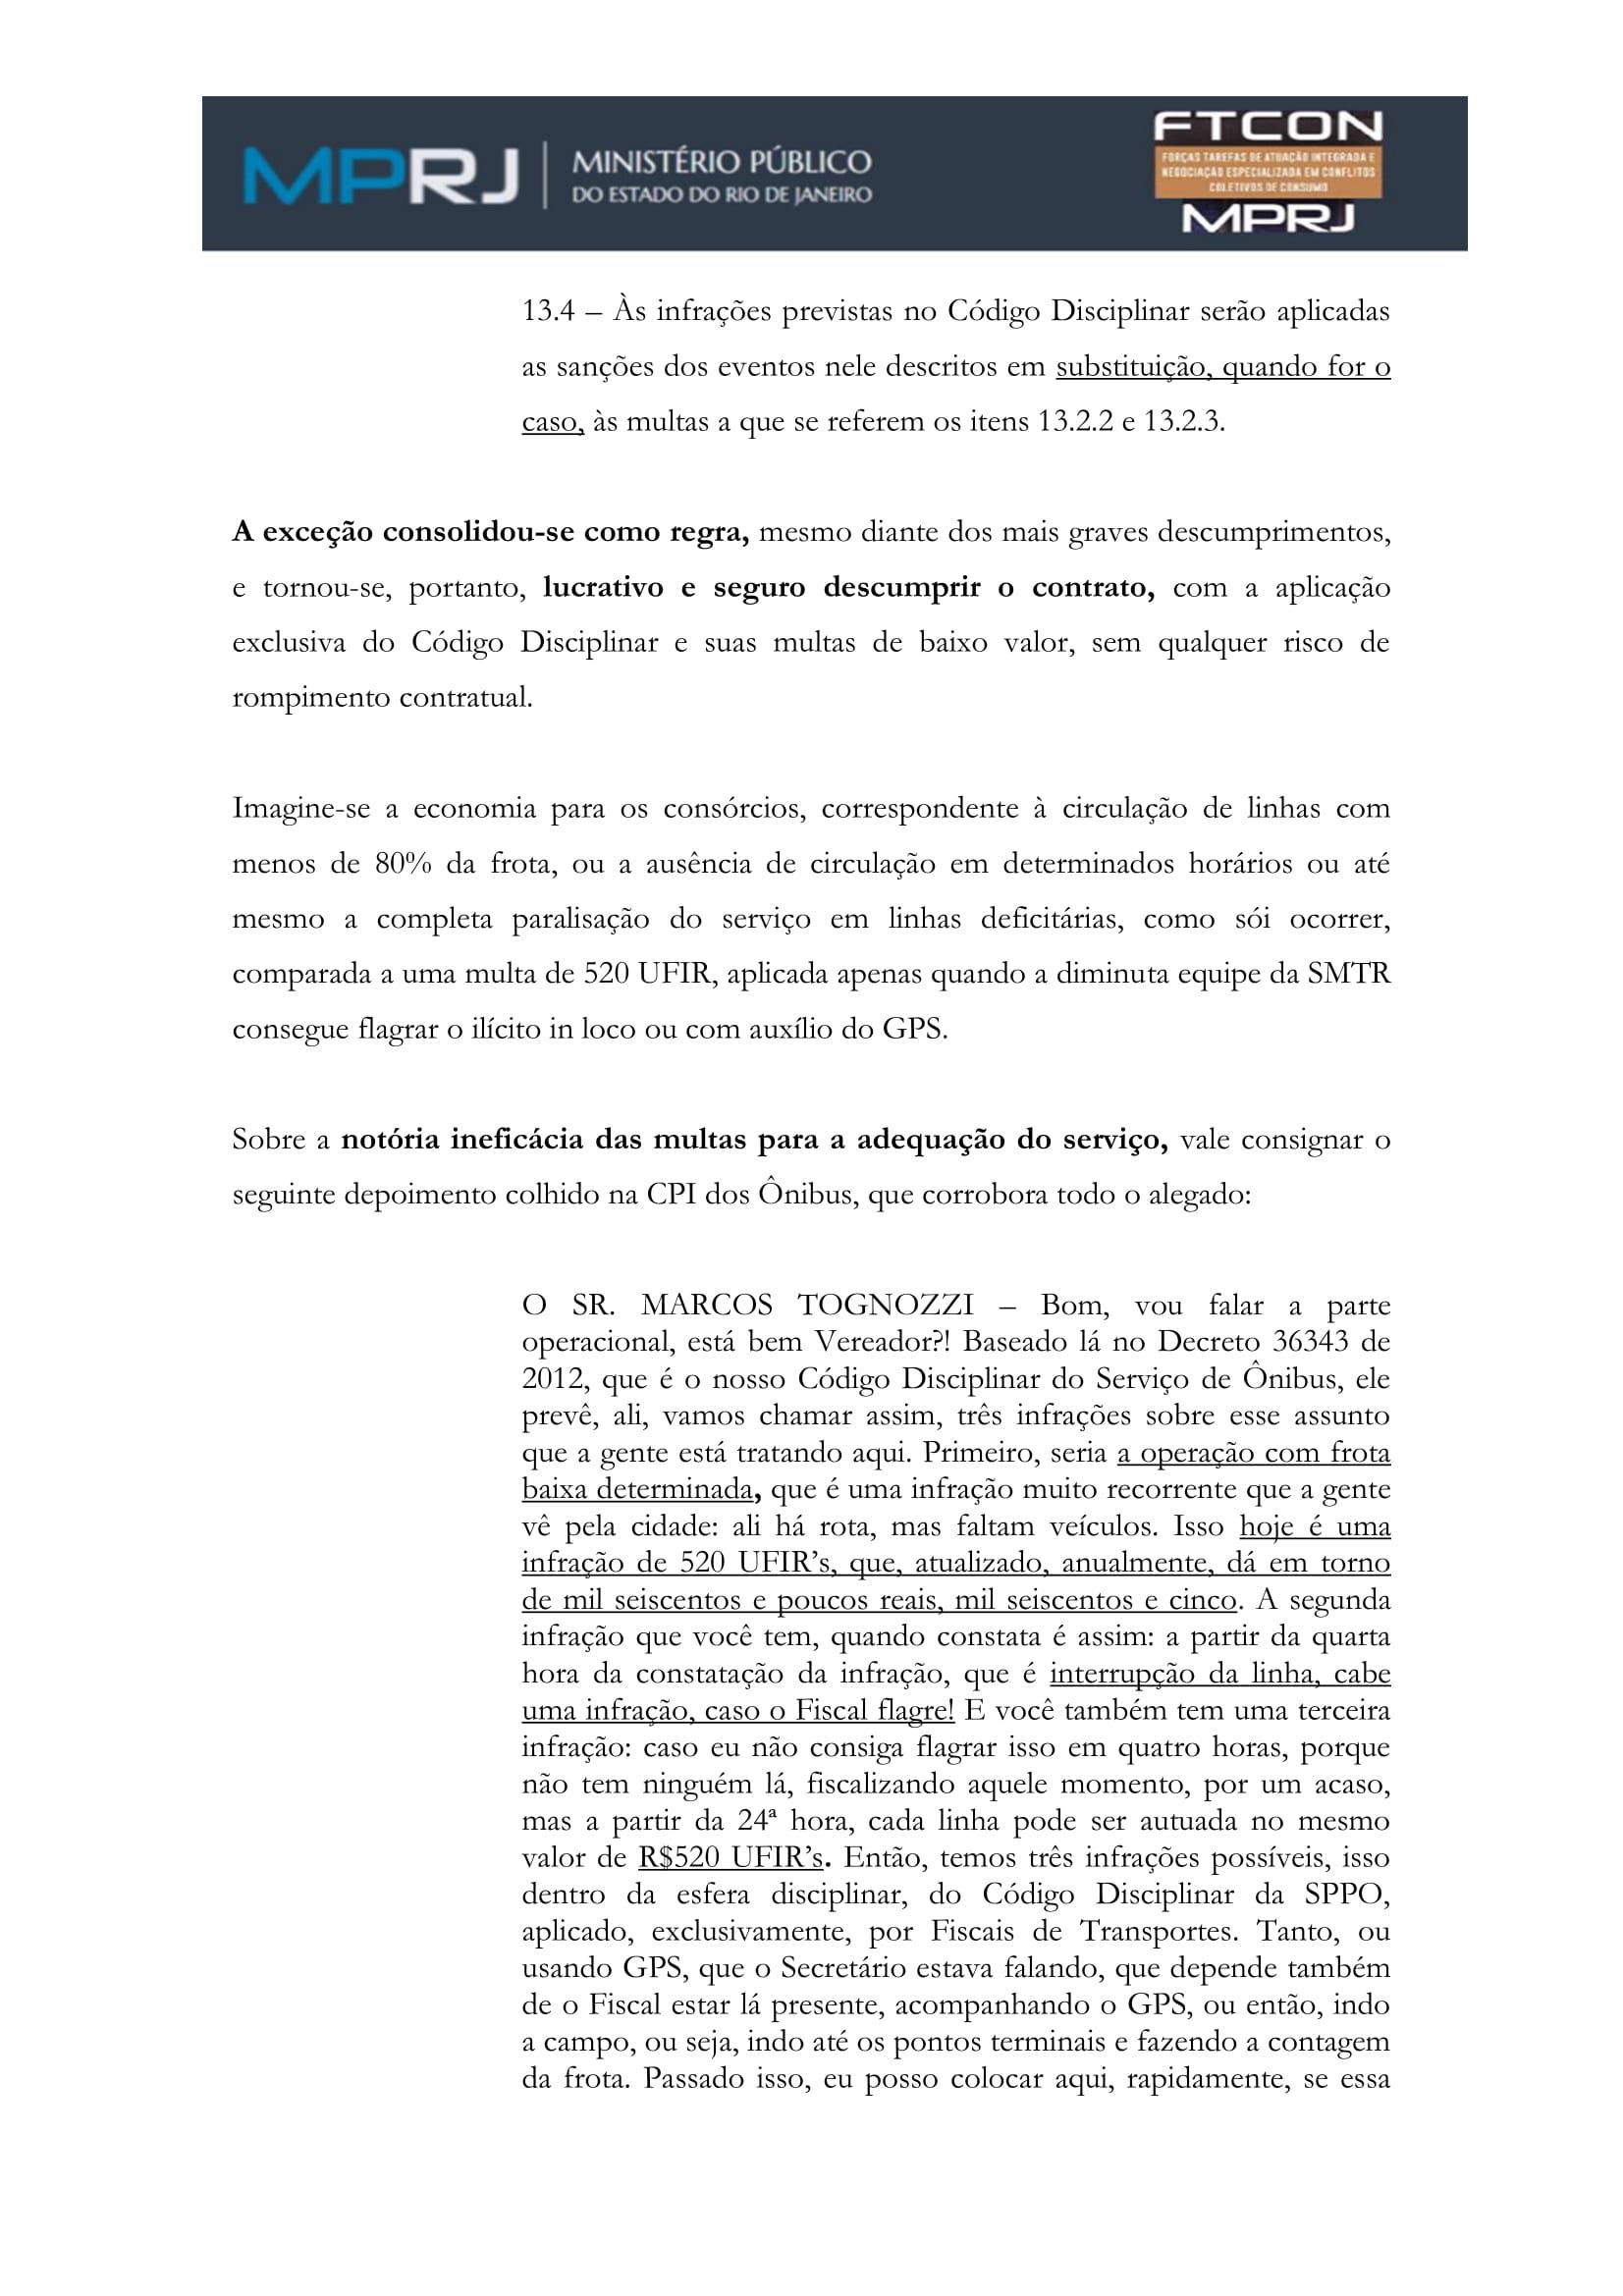 acp_caducidade_onibus_dr_rt-109